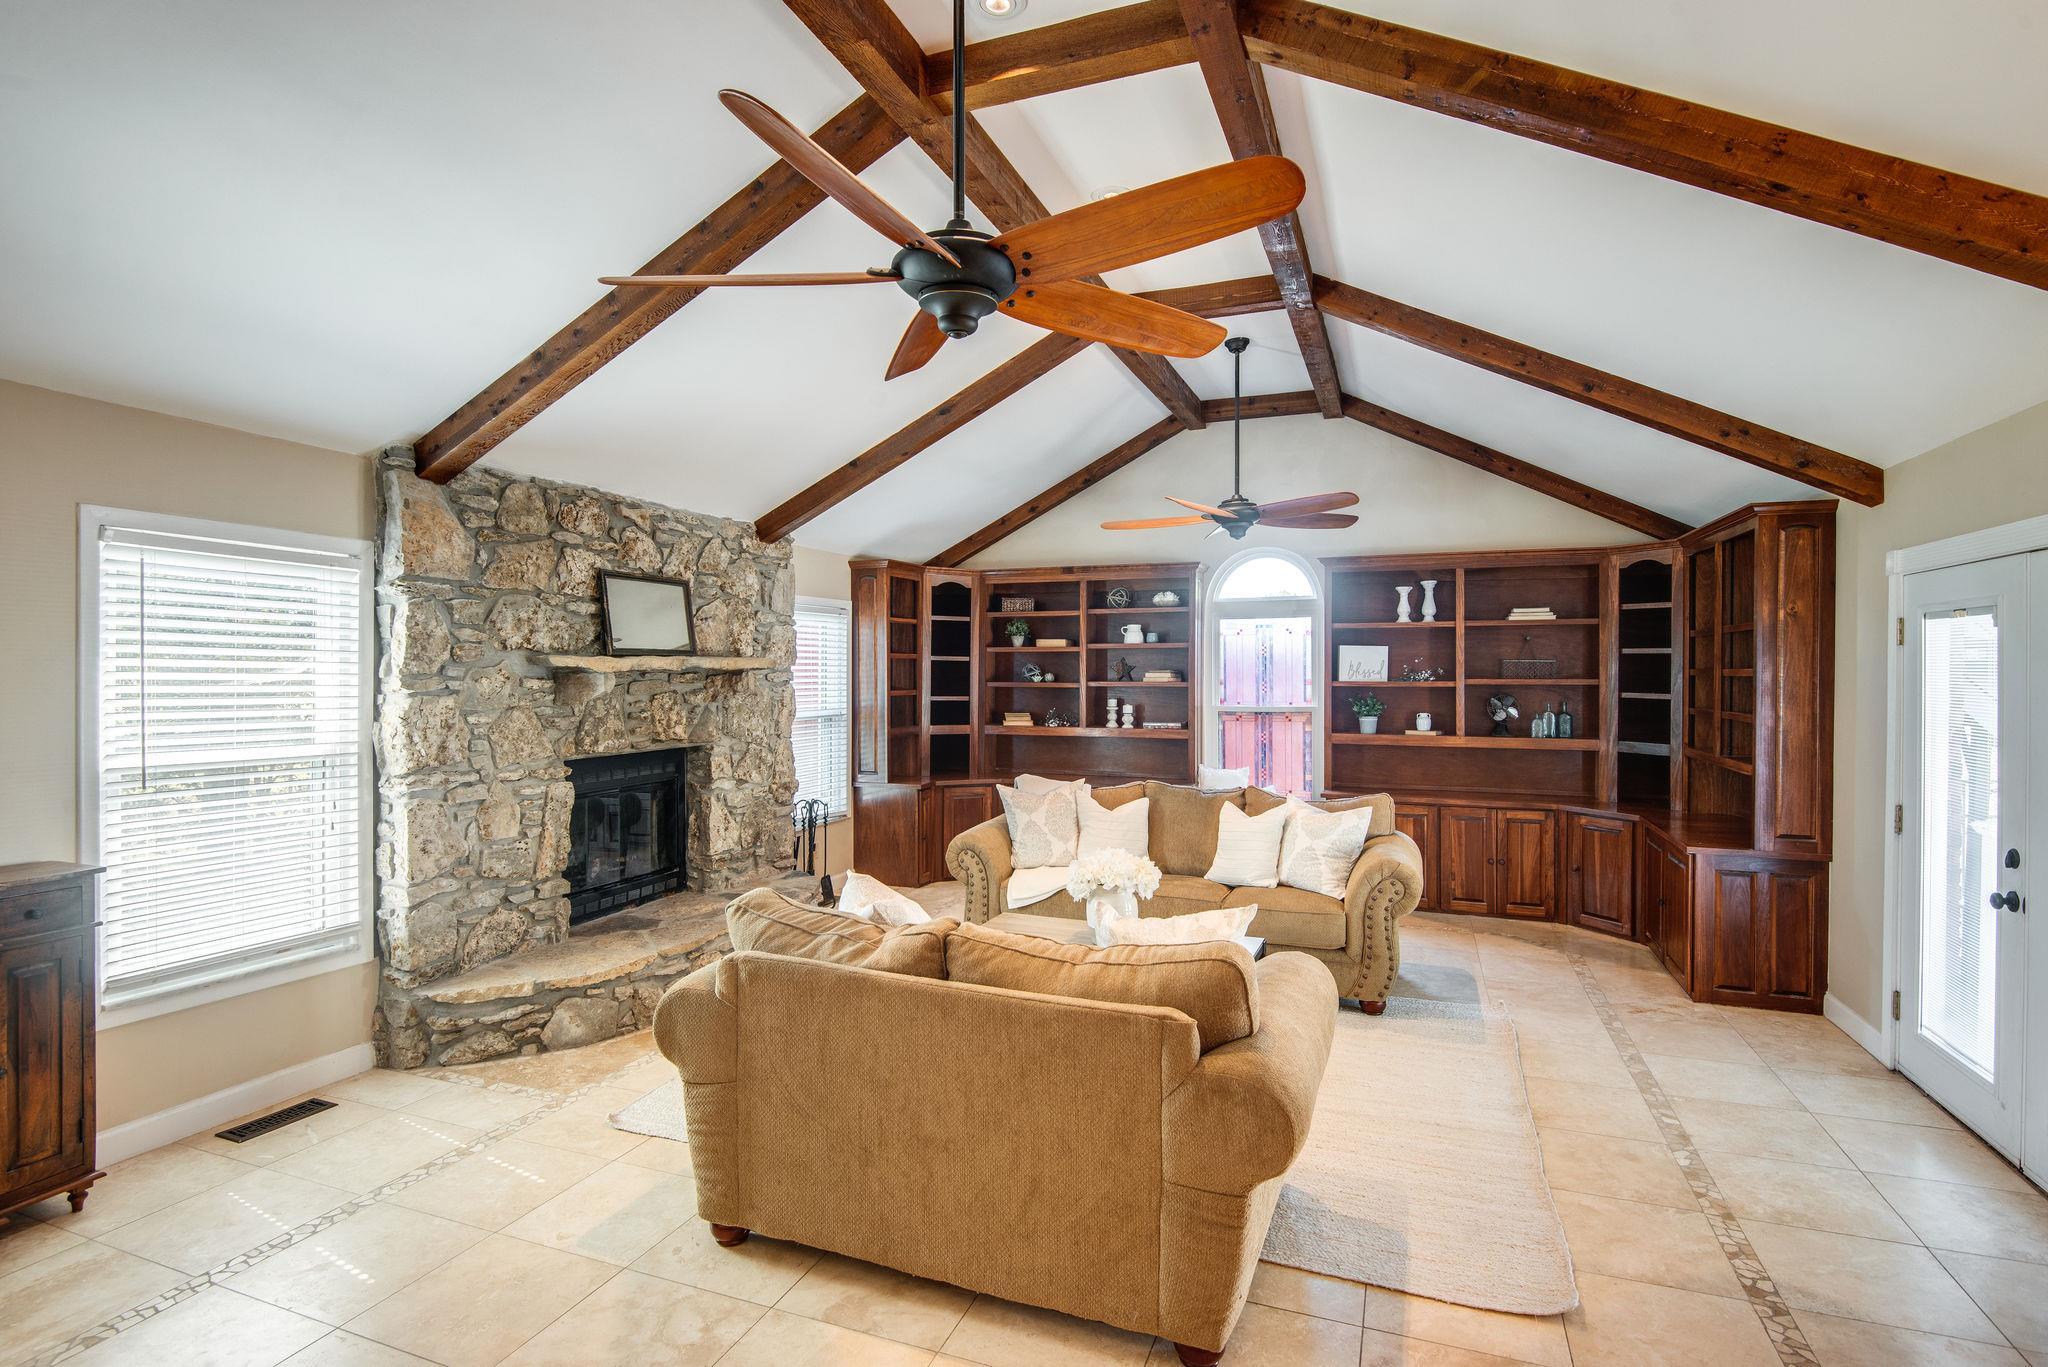 3601 Clark Rd, Lewisburg, TN 37091 - Lewisburg, TN real estate listing